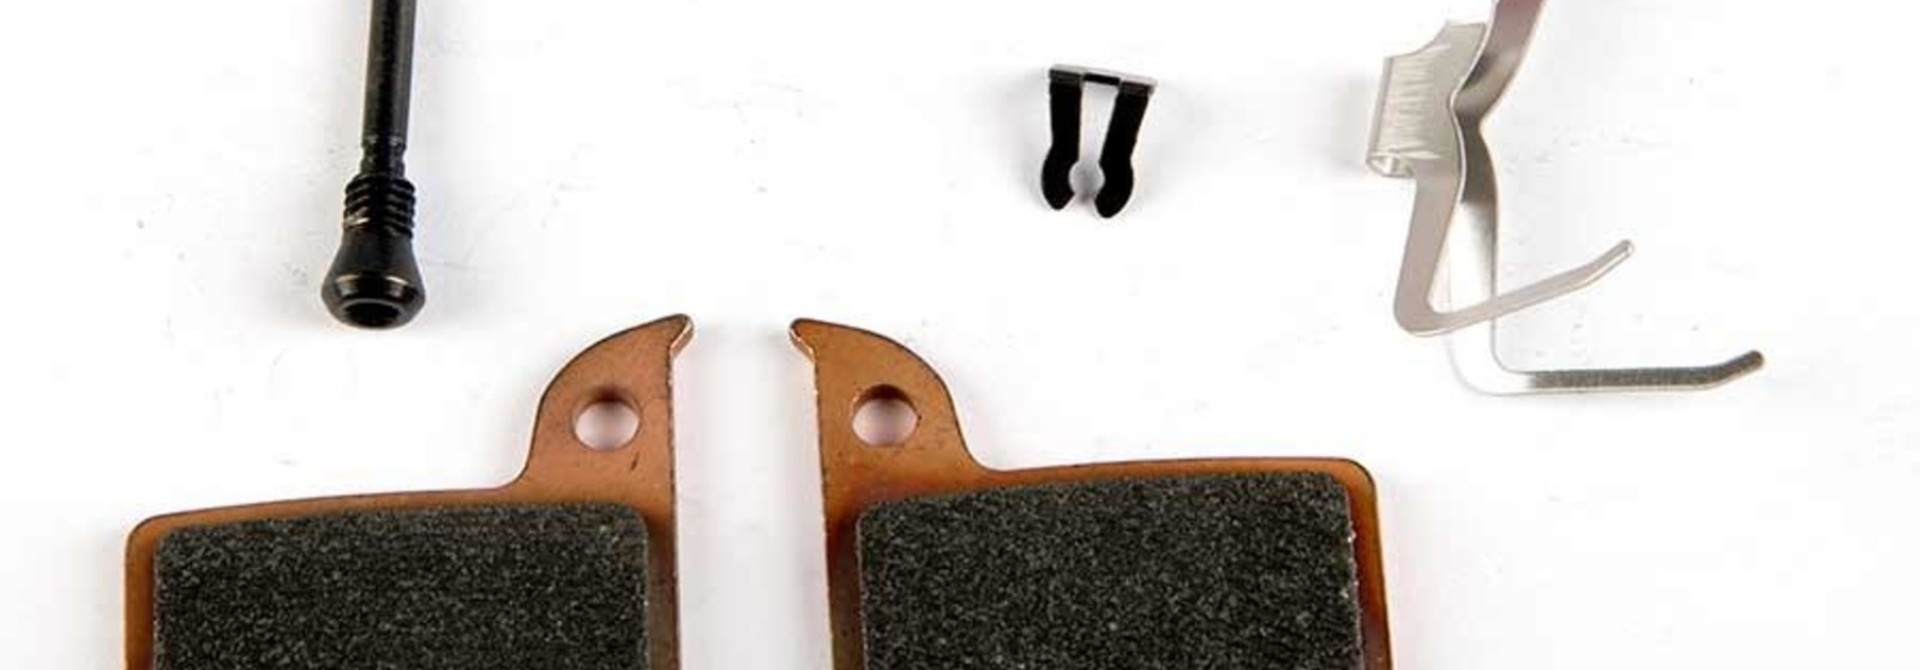 SRAM, Level TLM, Level Ultimate, HRD, Disc Brake Pads, Shape: SRAM HRD/Level TLM, Metallic, Pair